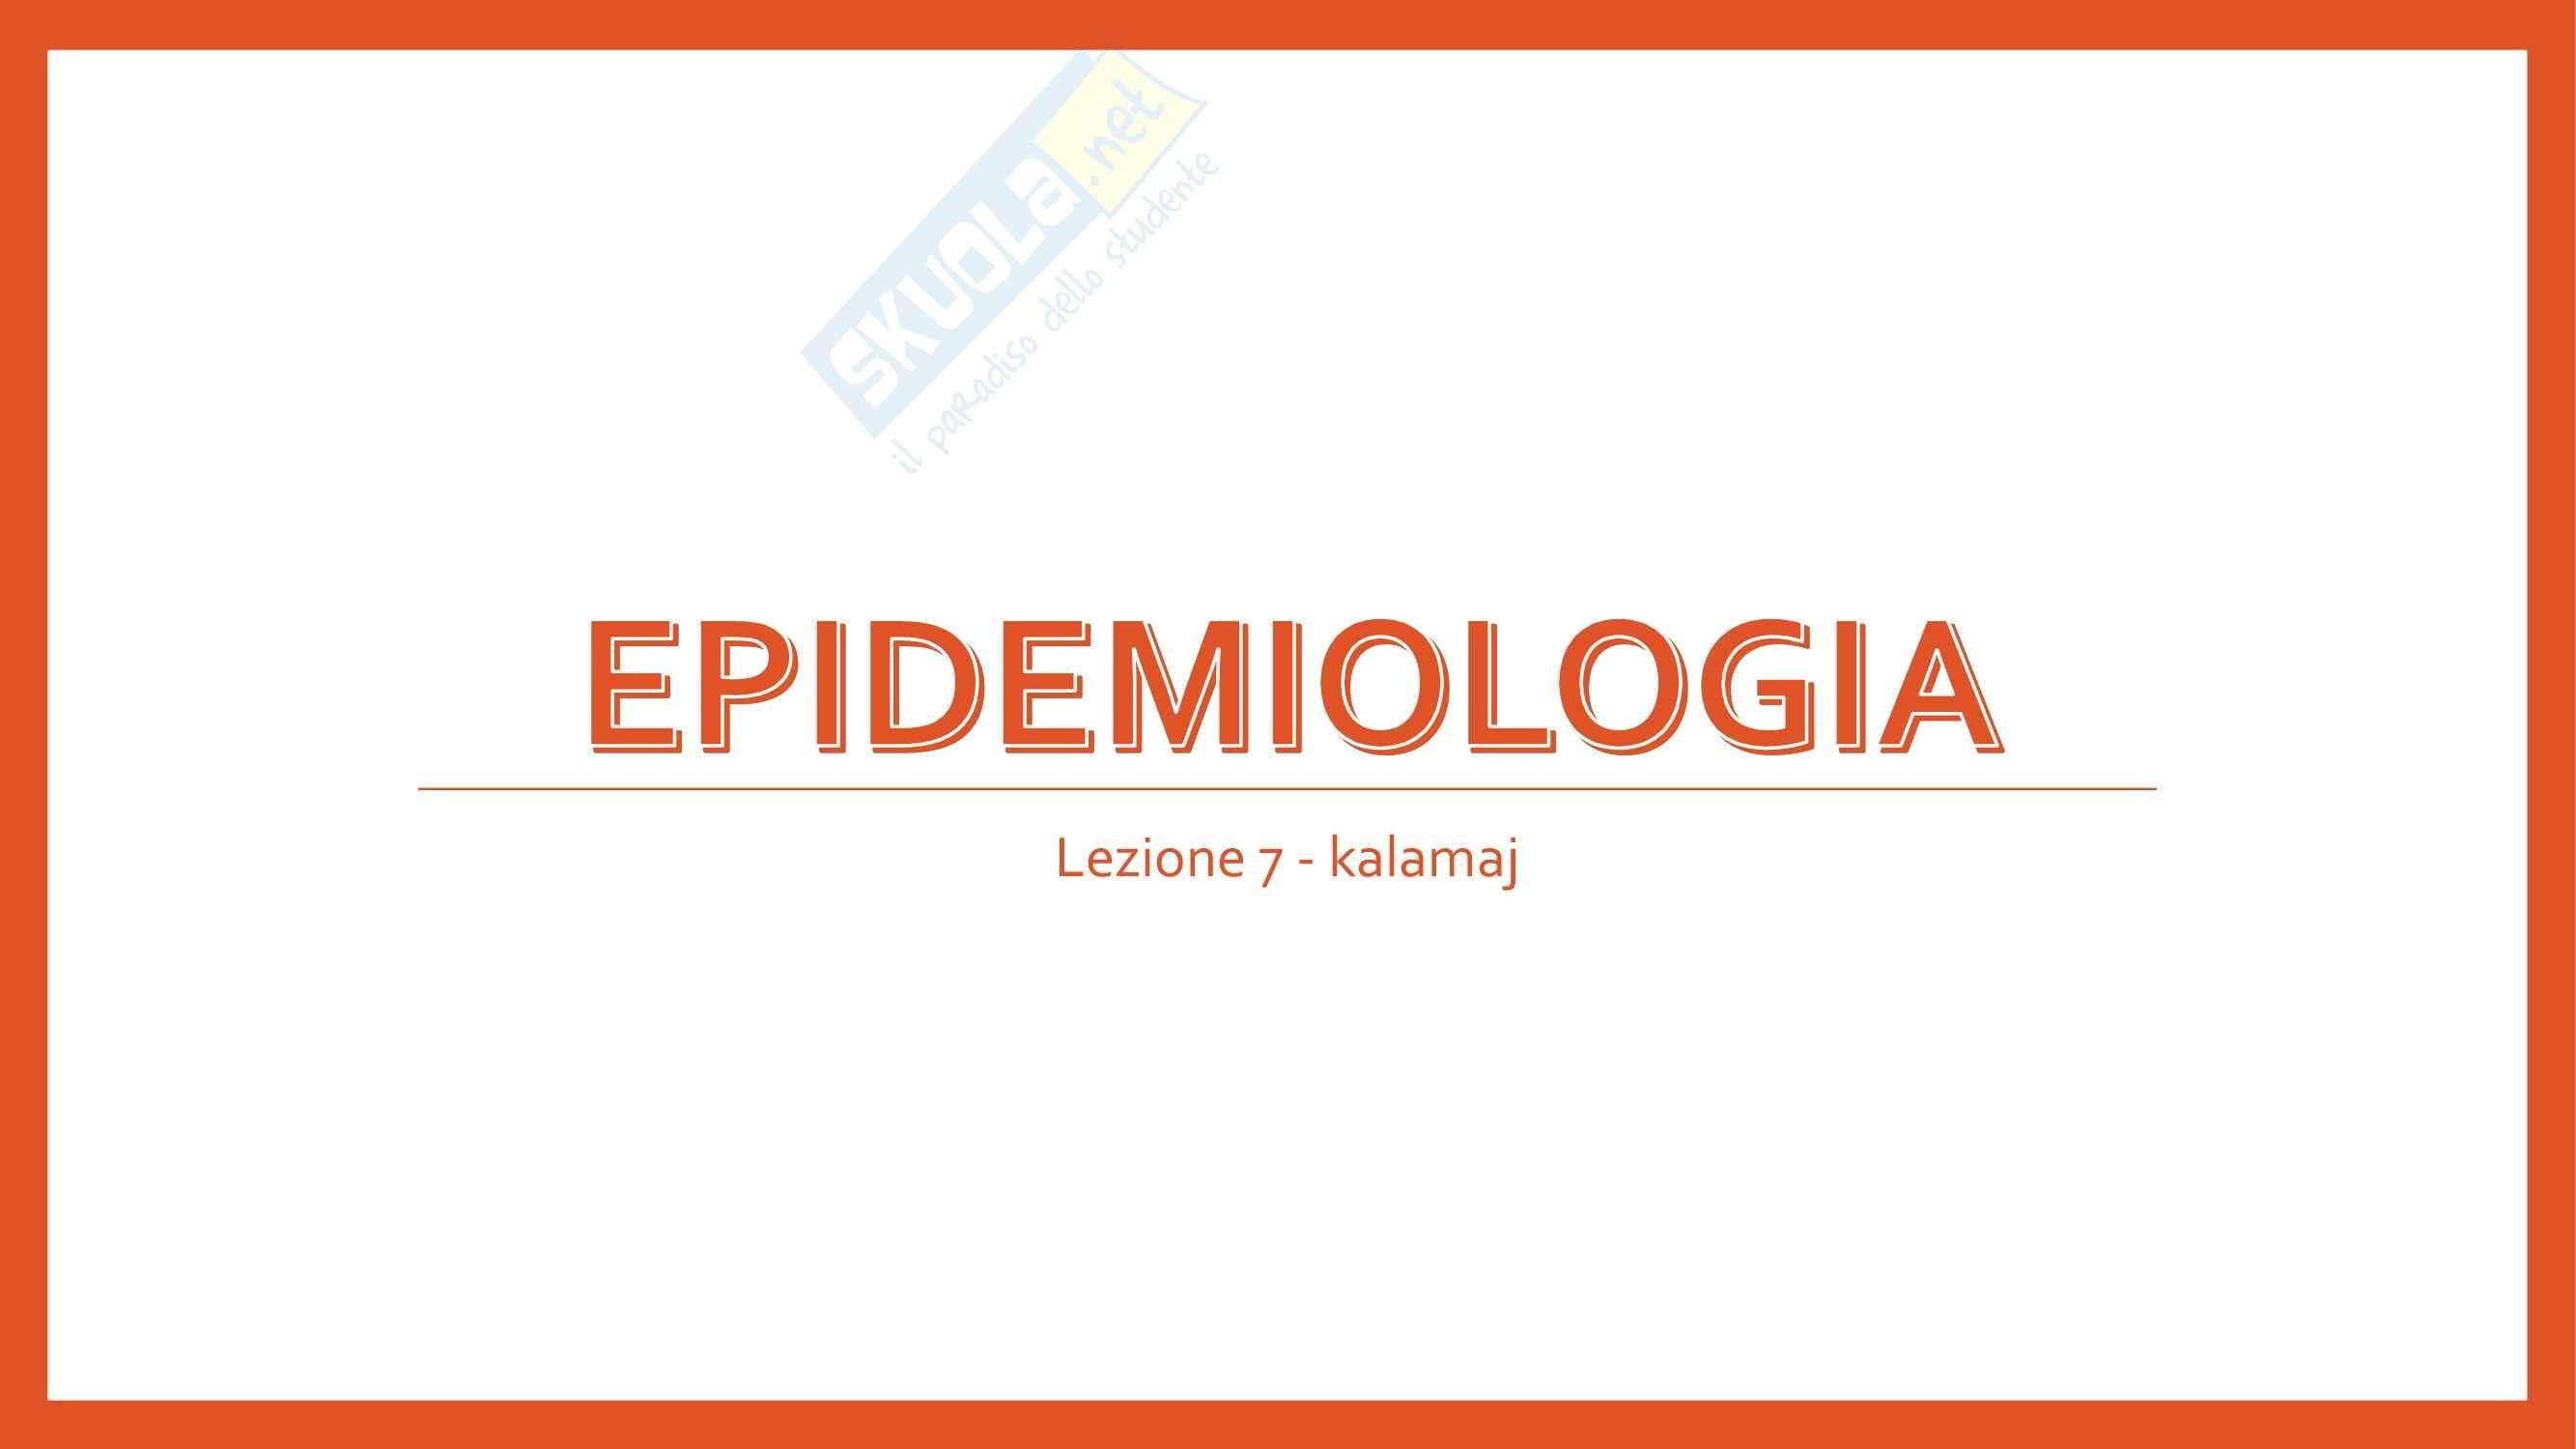 Epidemiologia - epidemiologia e epidemiologia sperimentale